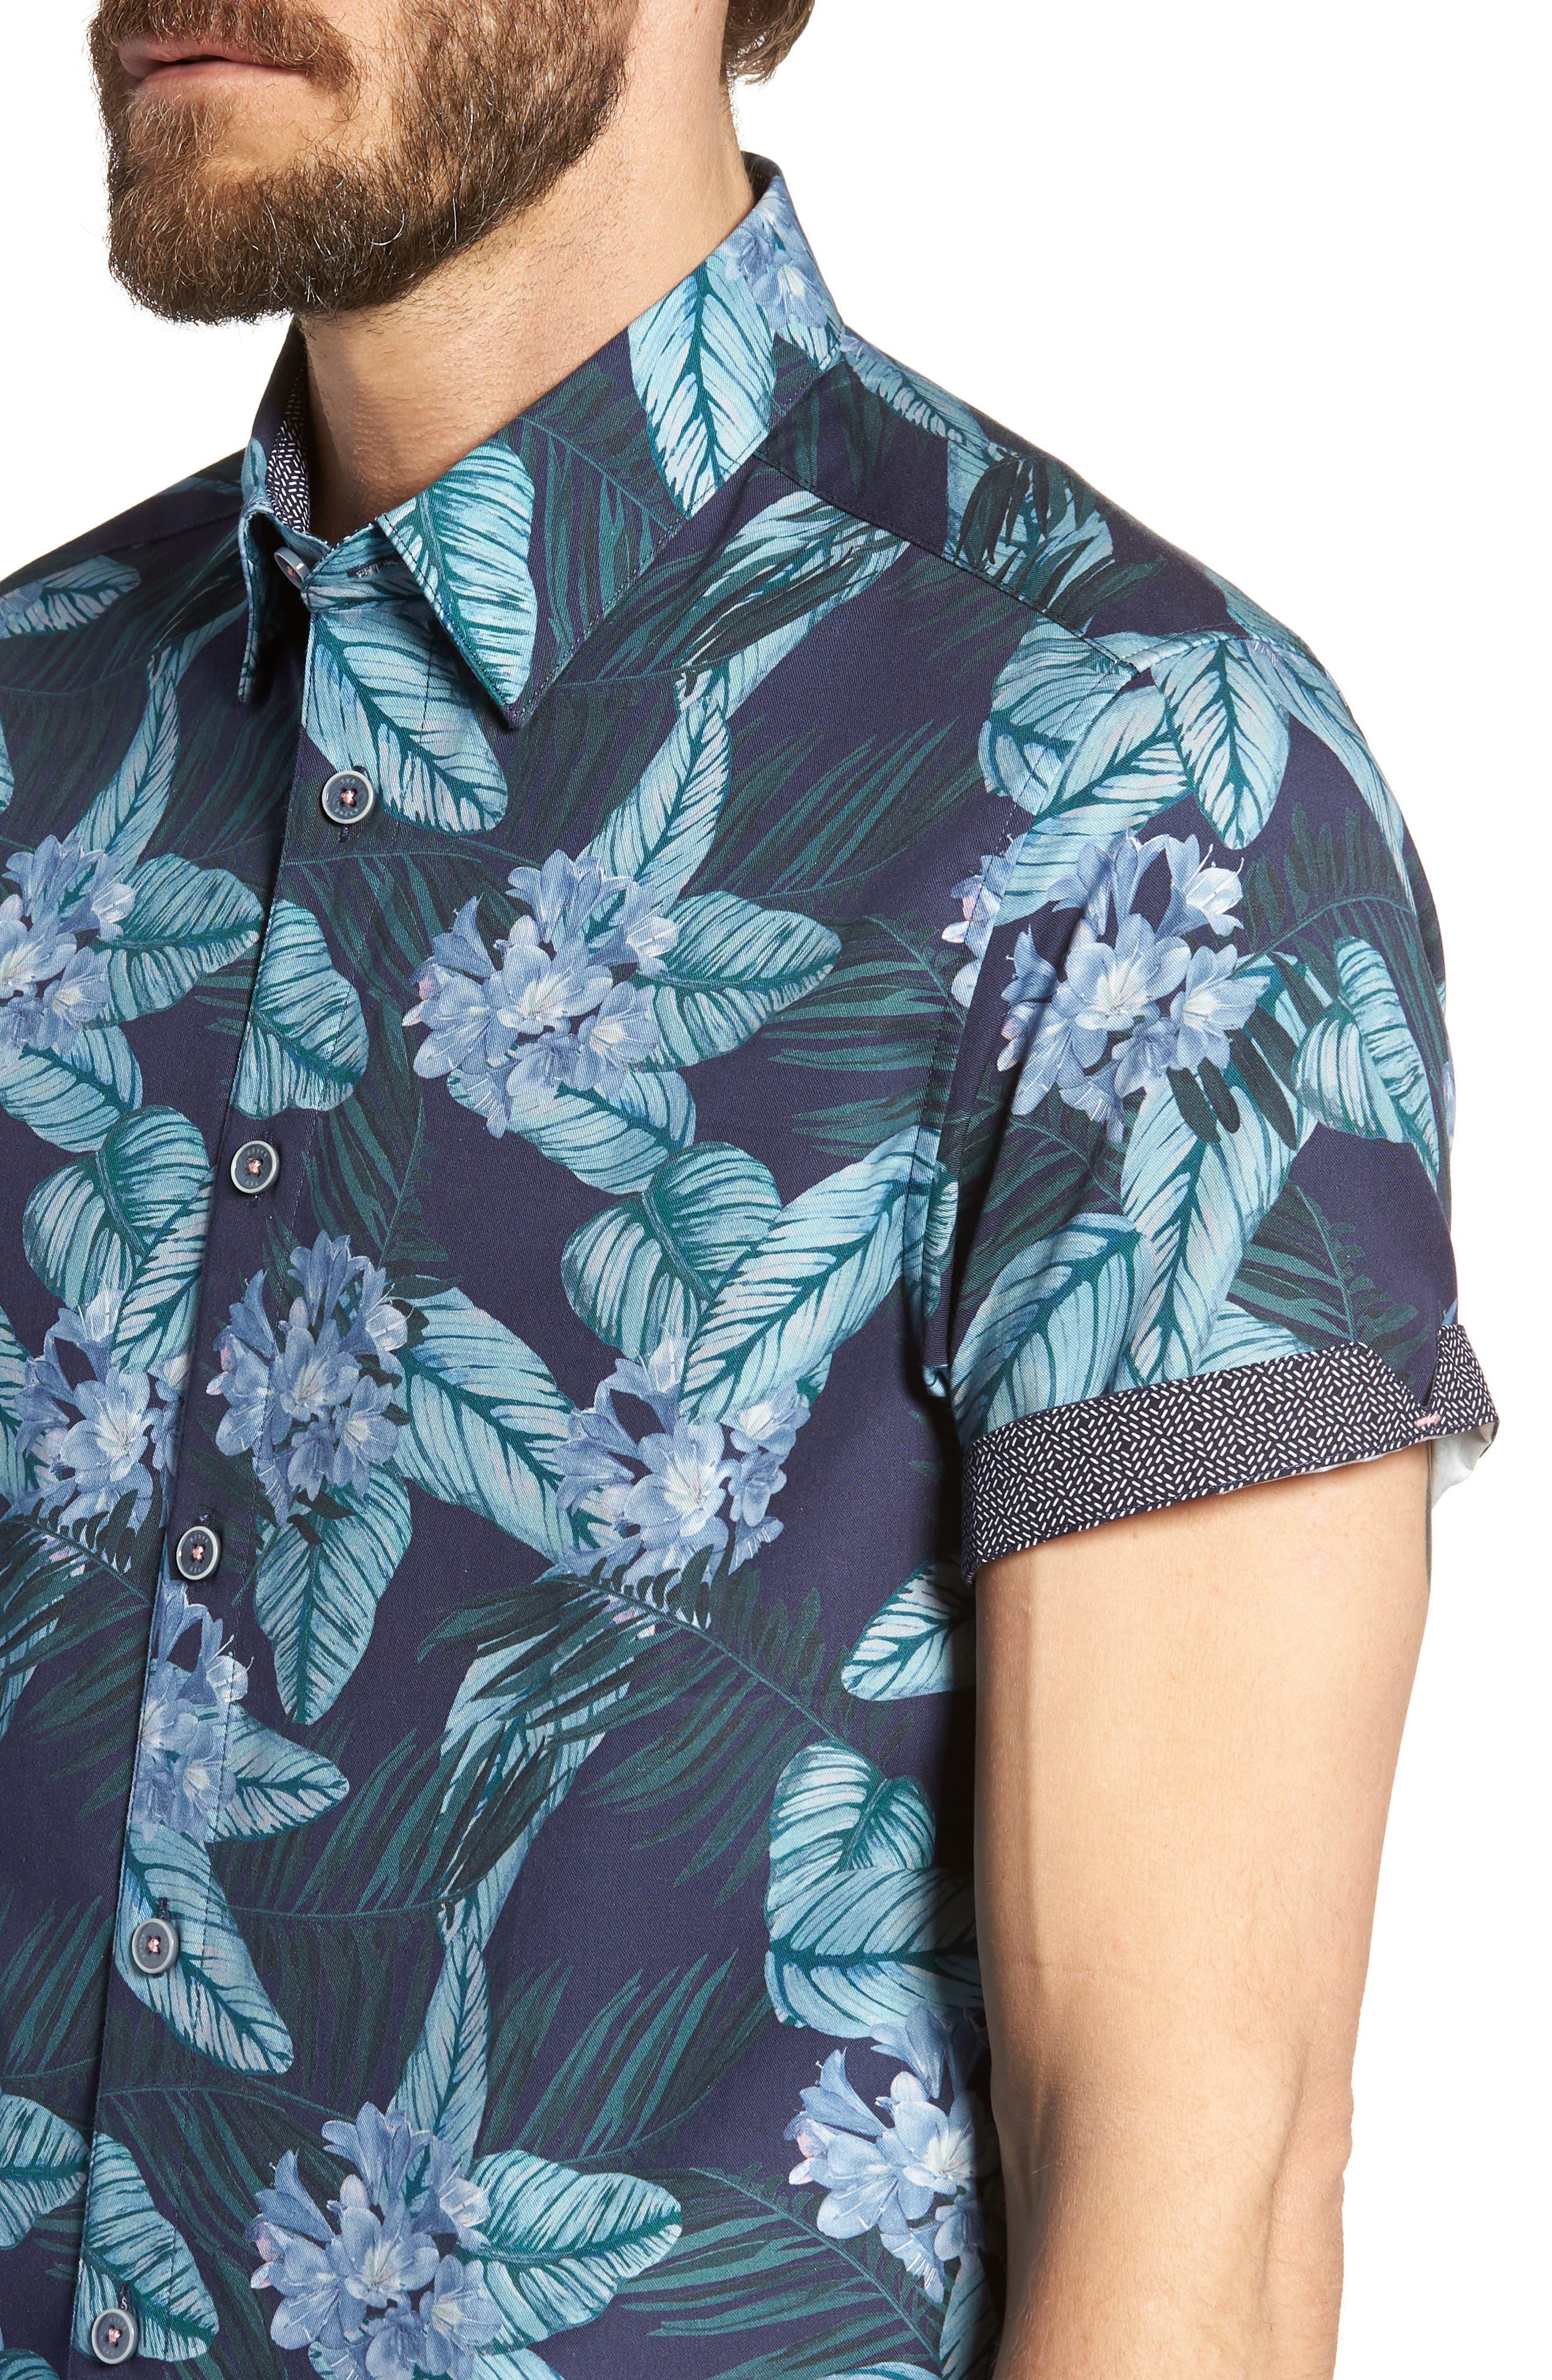 Folinor Slim Fit Floral Cotton Shirt,                             Alternate thumbnail 2, color,                             Navy